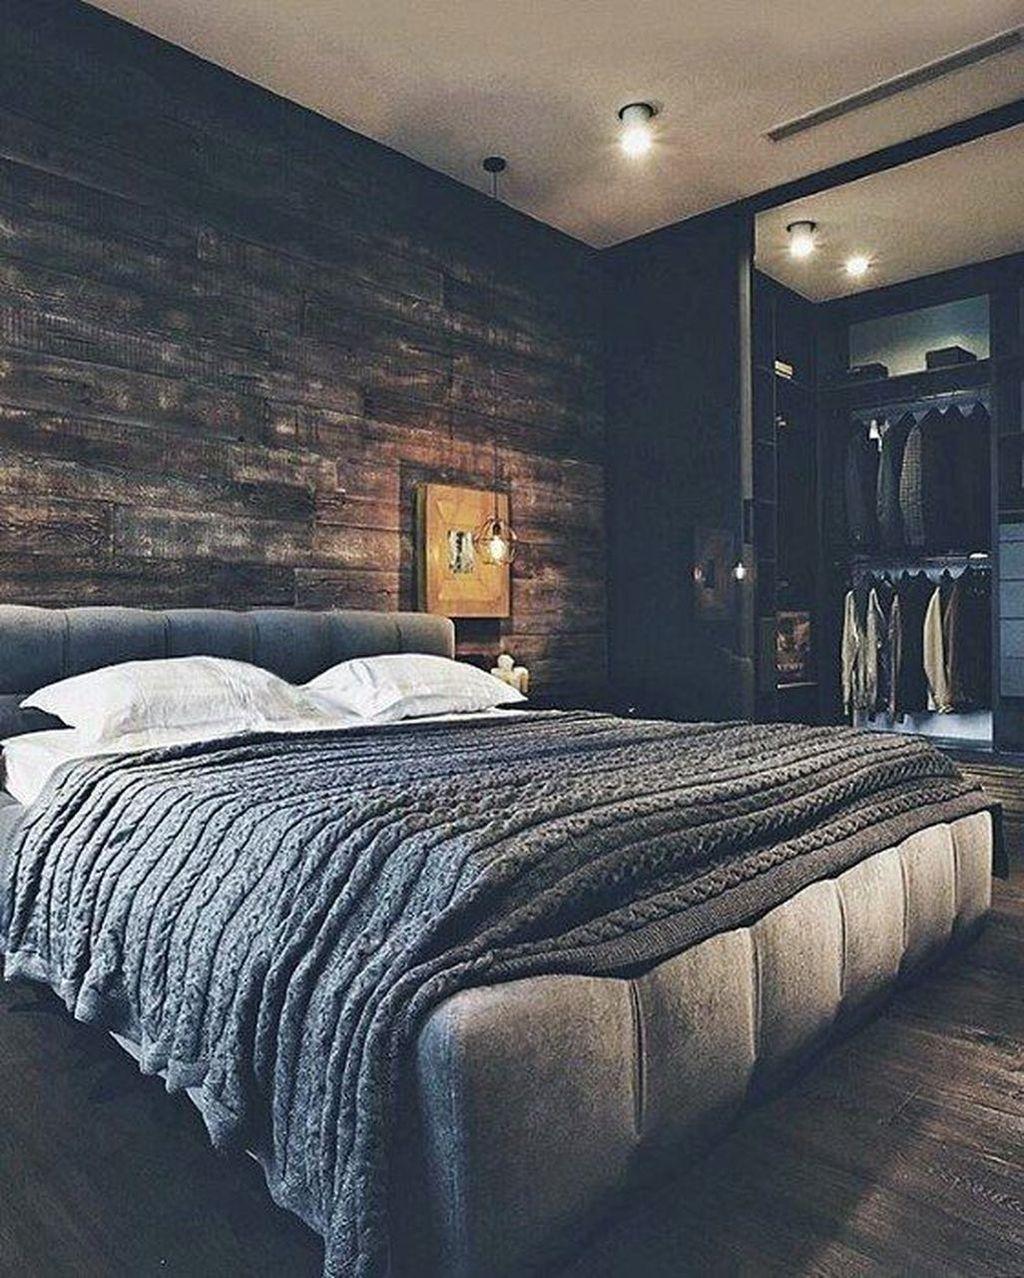 Amazing Bedroom Designs With Bathroom 51